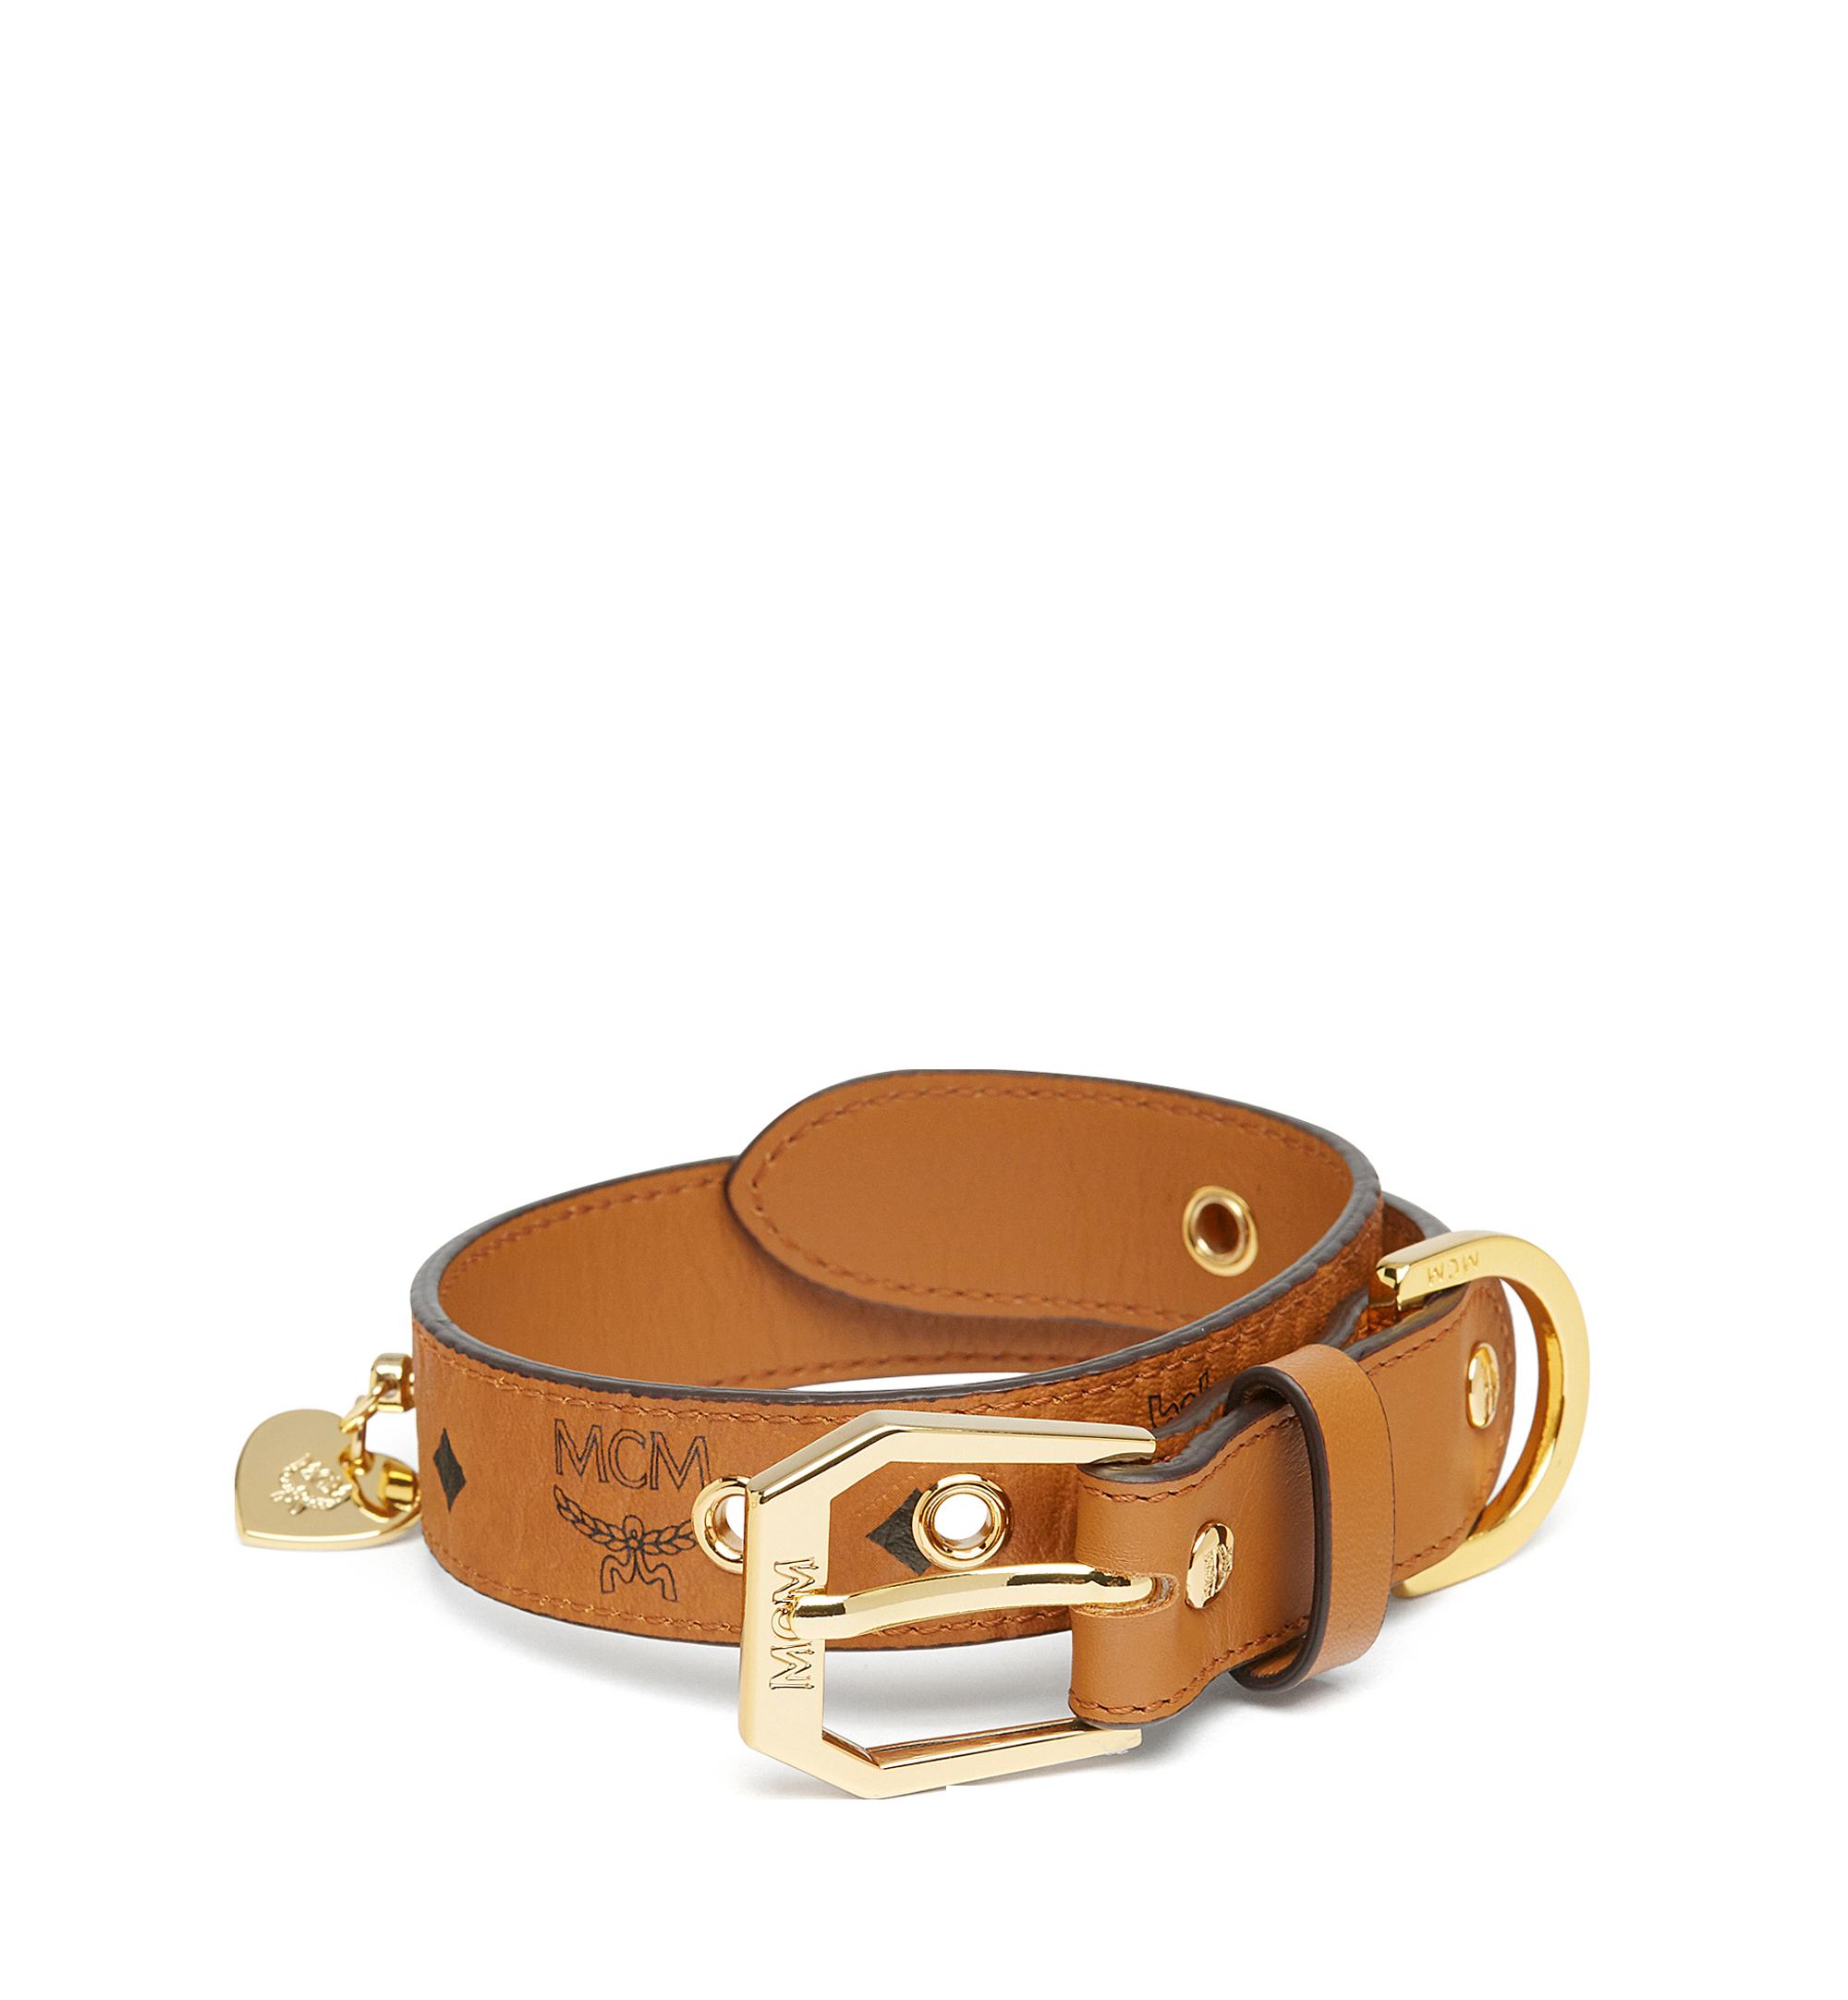 MCM Dog Collar in Visetos Cognac MEZ7AVP05CO001 Alternate View 1